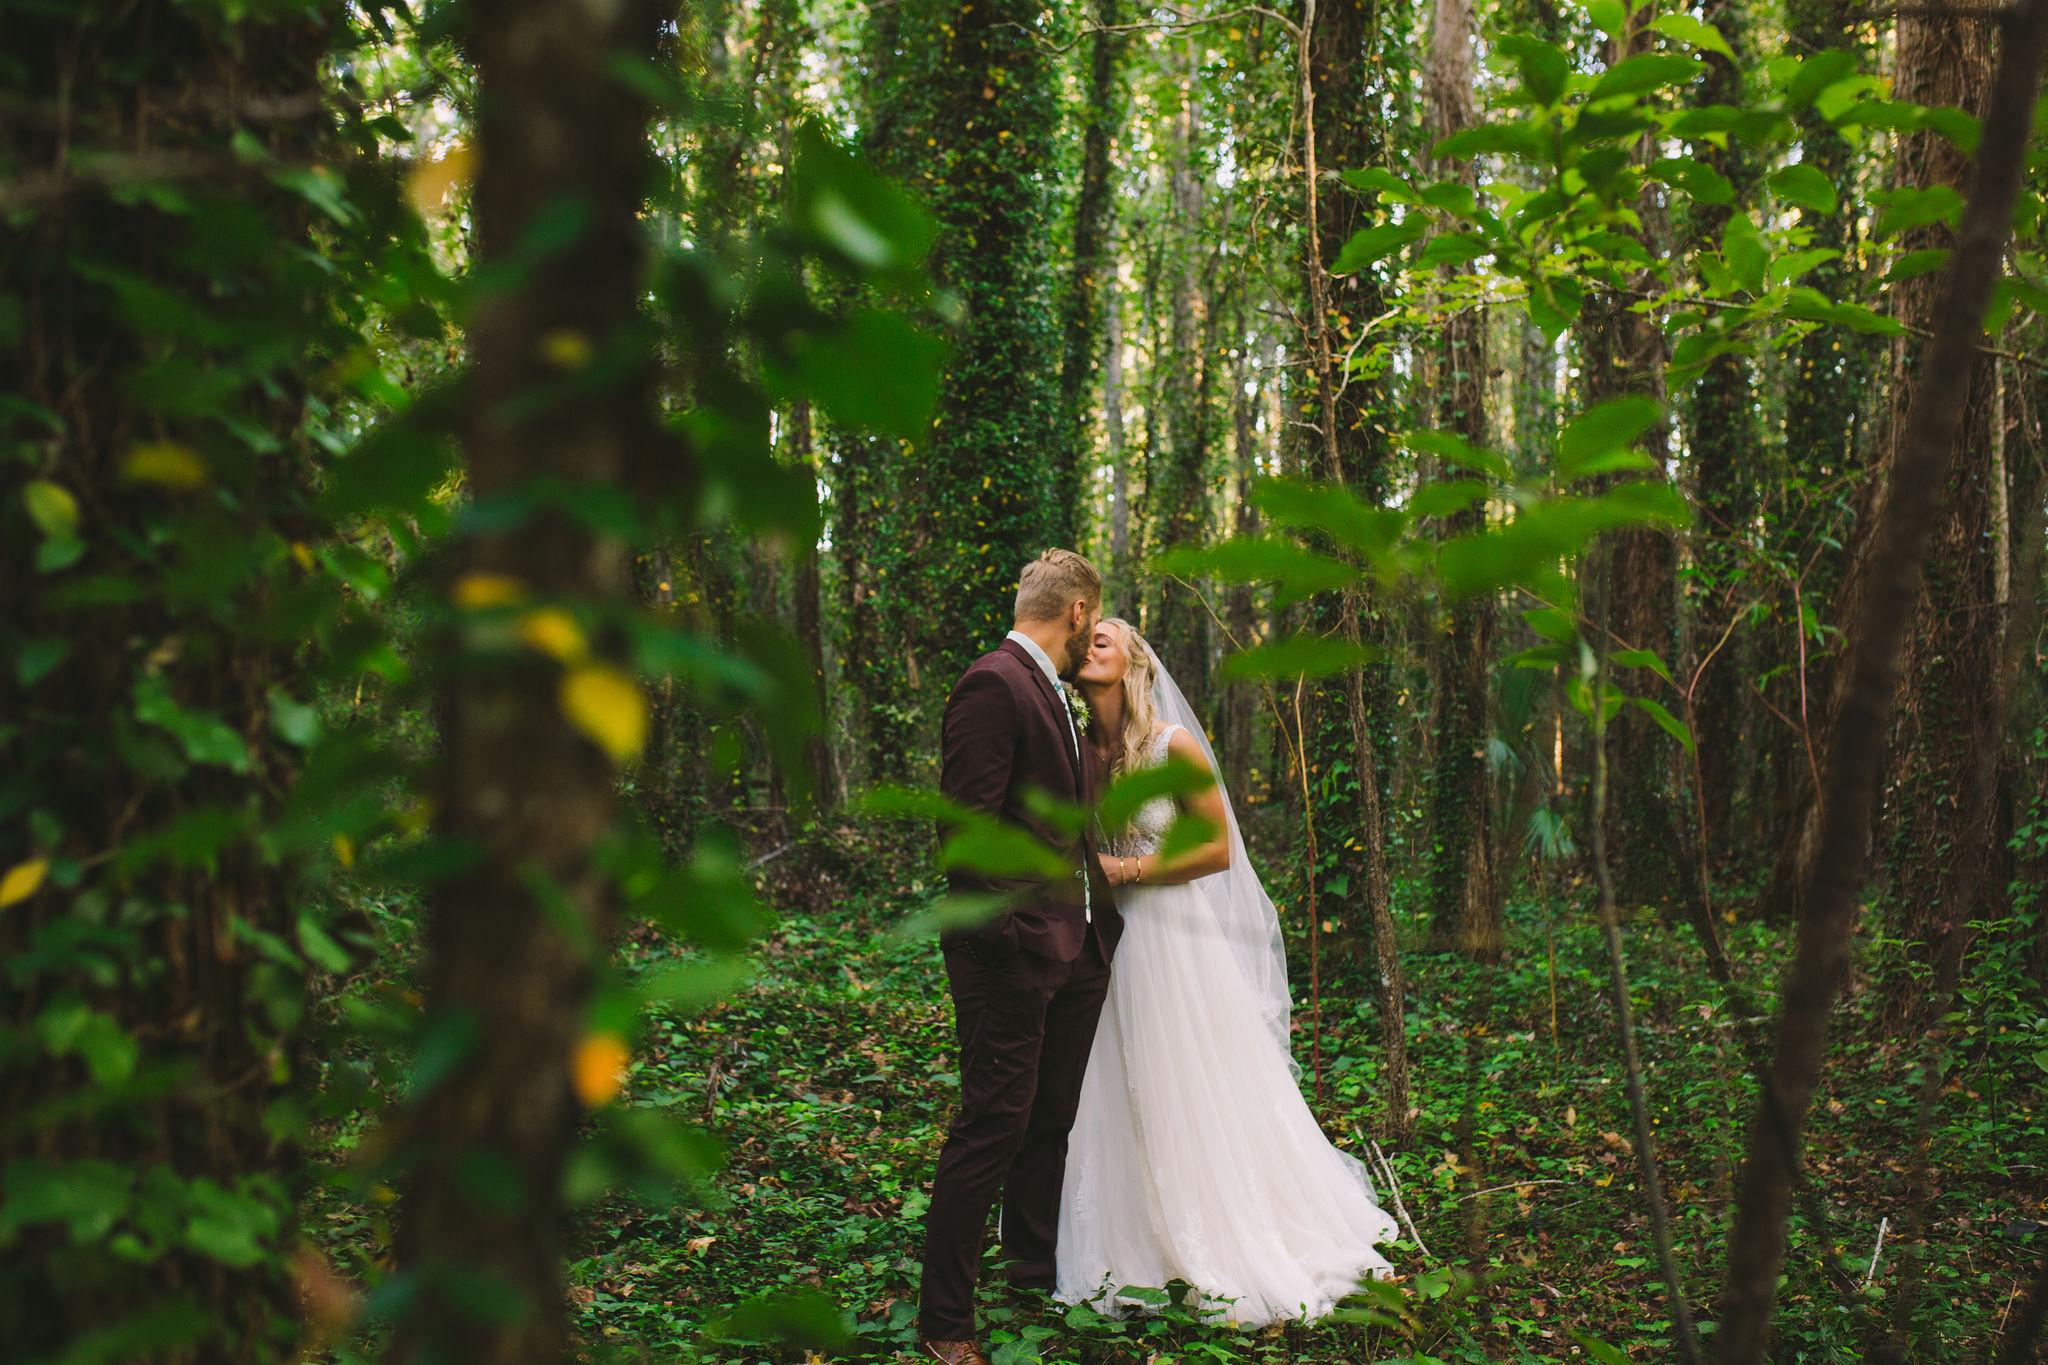 Jesseandlex_181103_AlexisNate_Wedding_BrideGroom_170.jpg